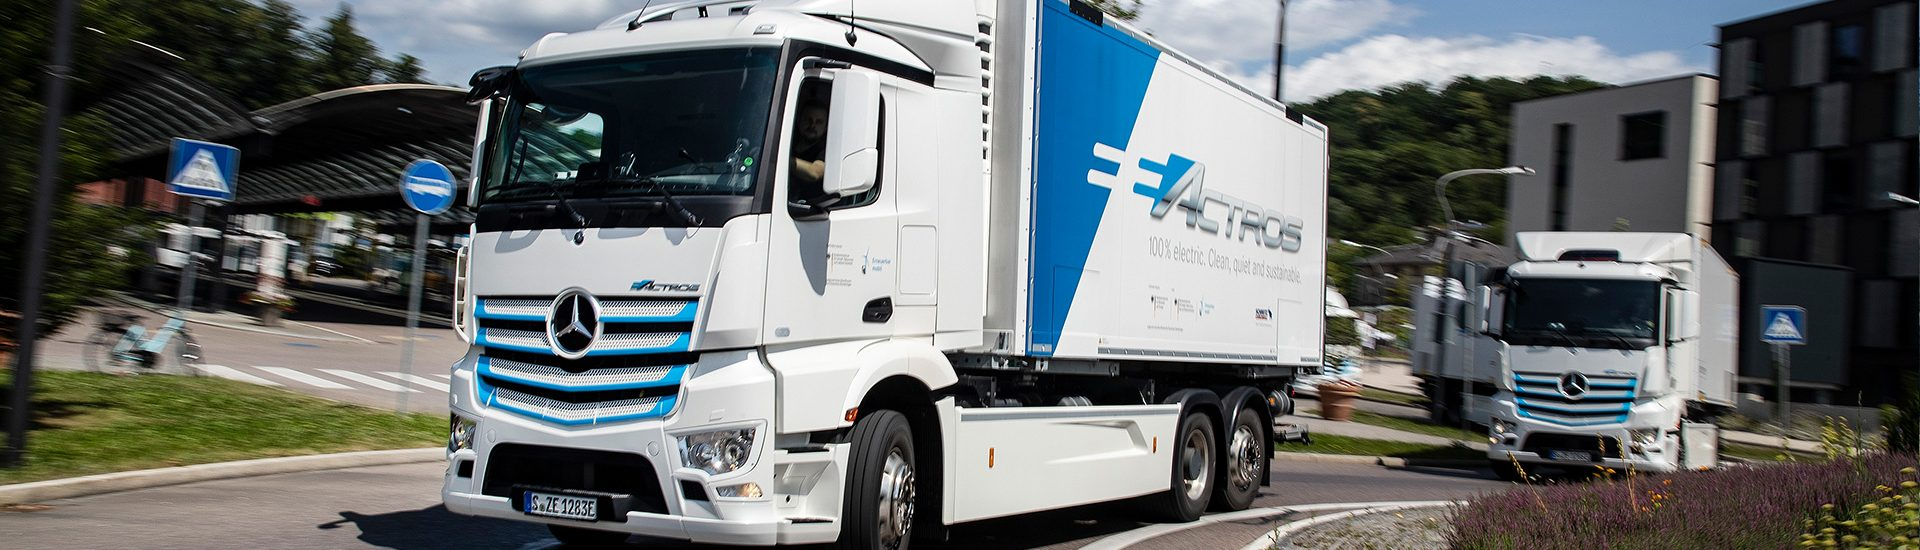 30 червня дебютує електрична вантажівка Mercedes eActros